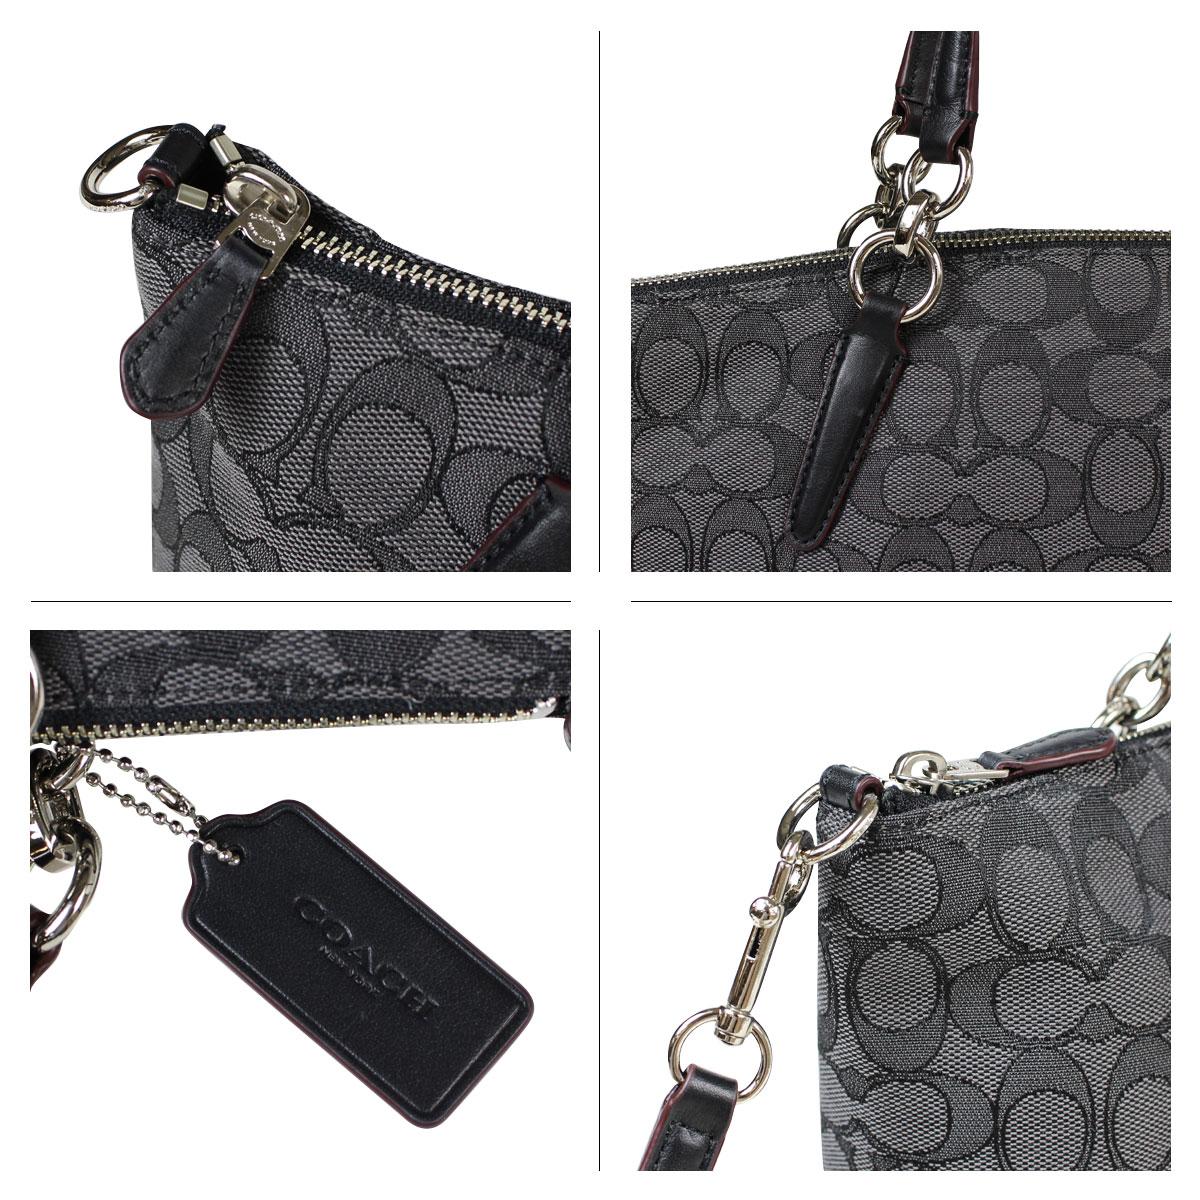 d6ab4d3780 ALLSPORTS  COACH coach bag handbag bag F36625 smoked black × Black ...